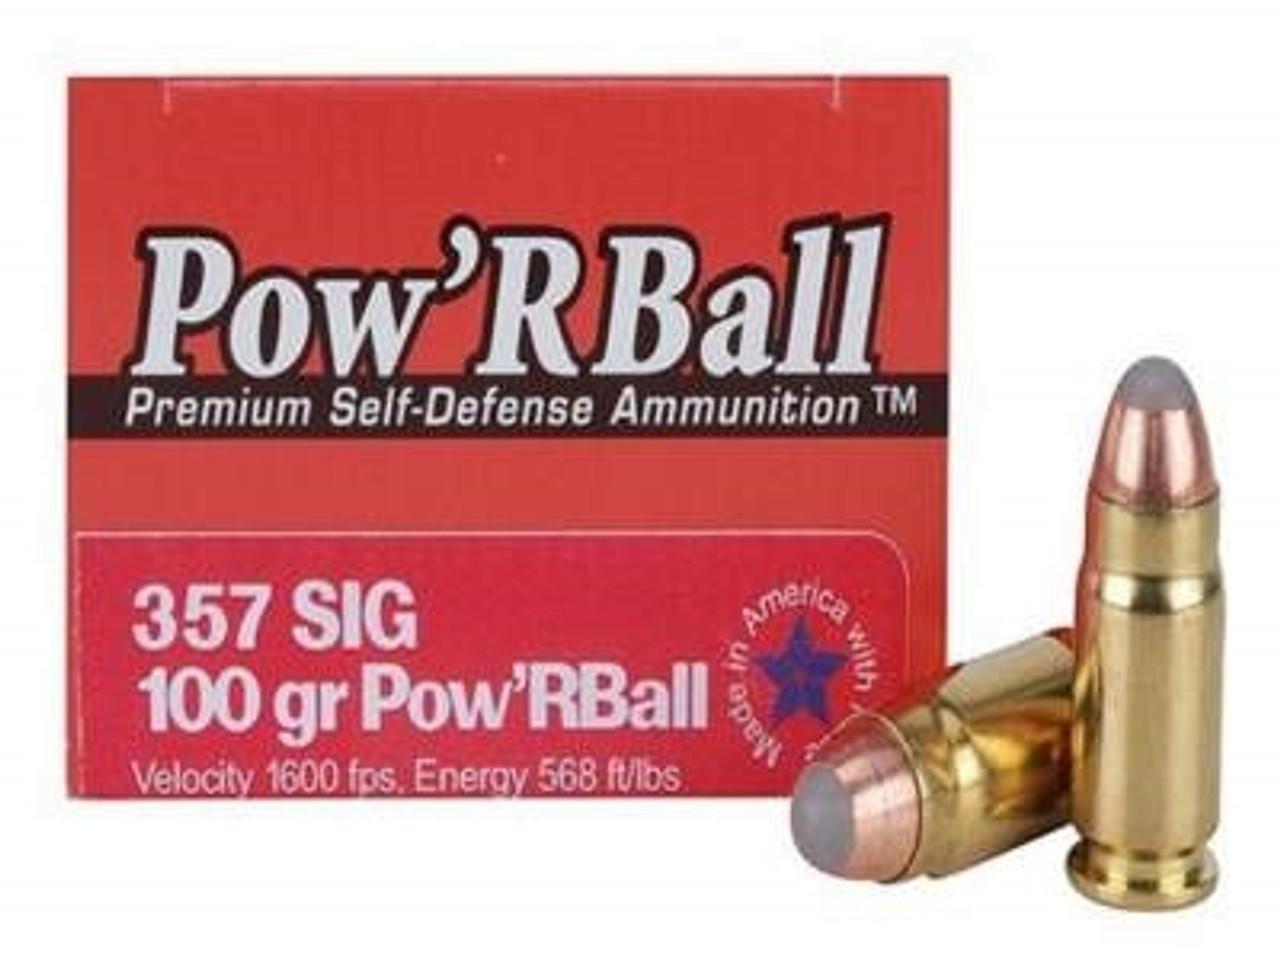 Glaser Corbon 357 SIG PB357SIG100 Ammunition 100 Grain Pow'r Ball 20 rounds